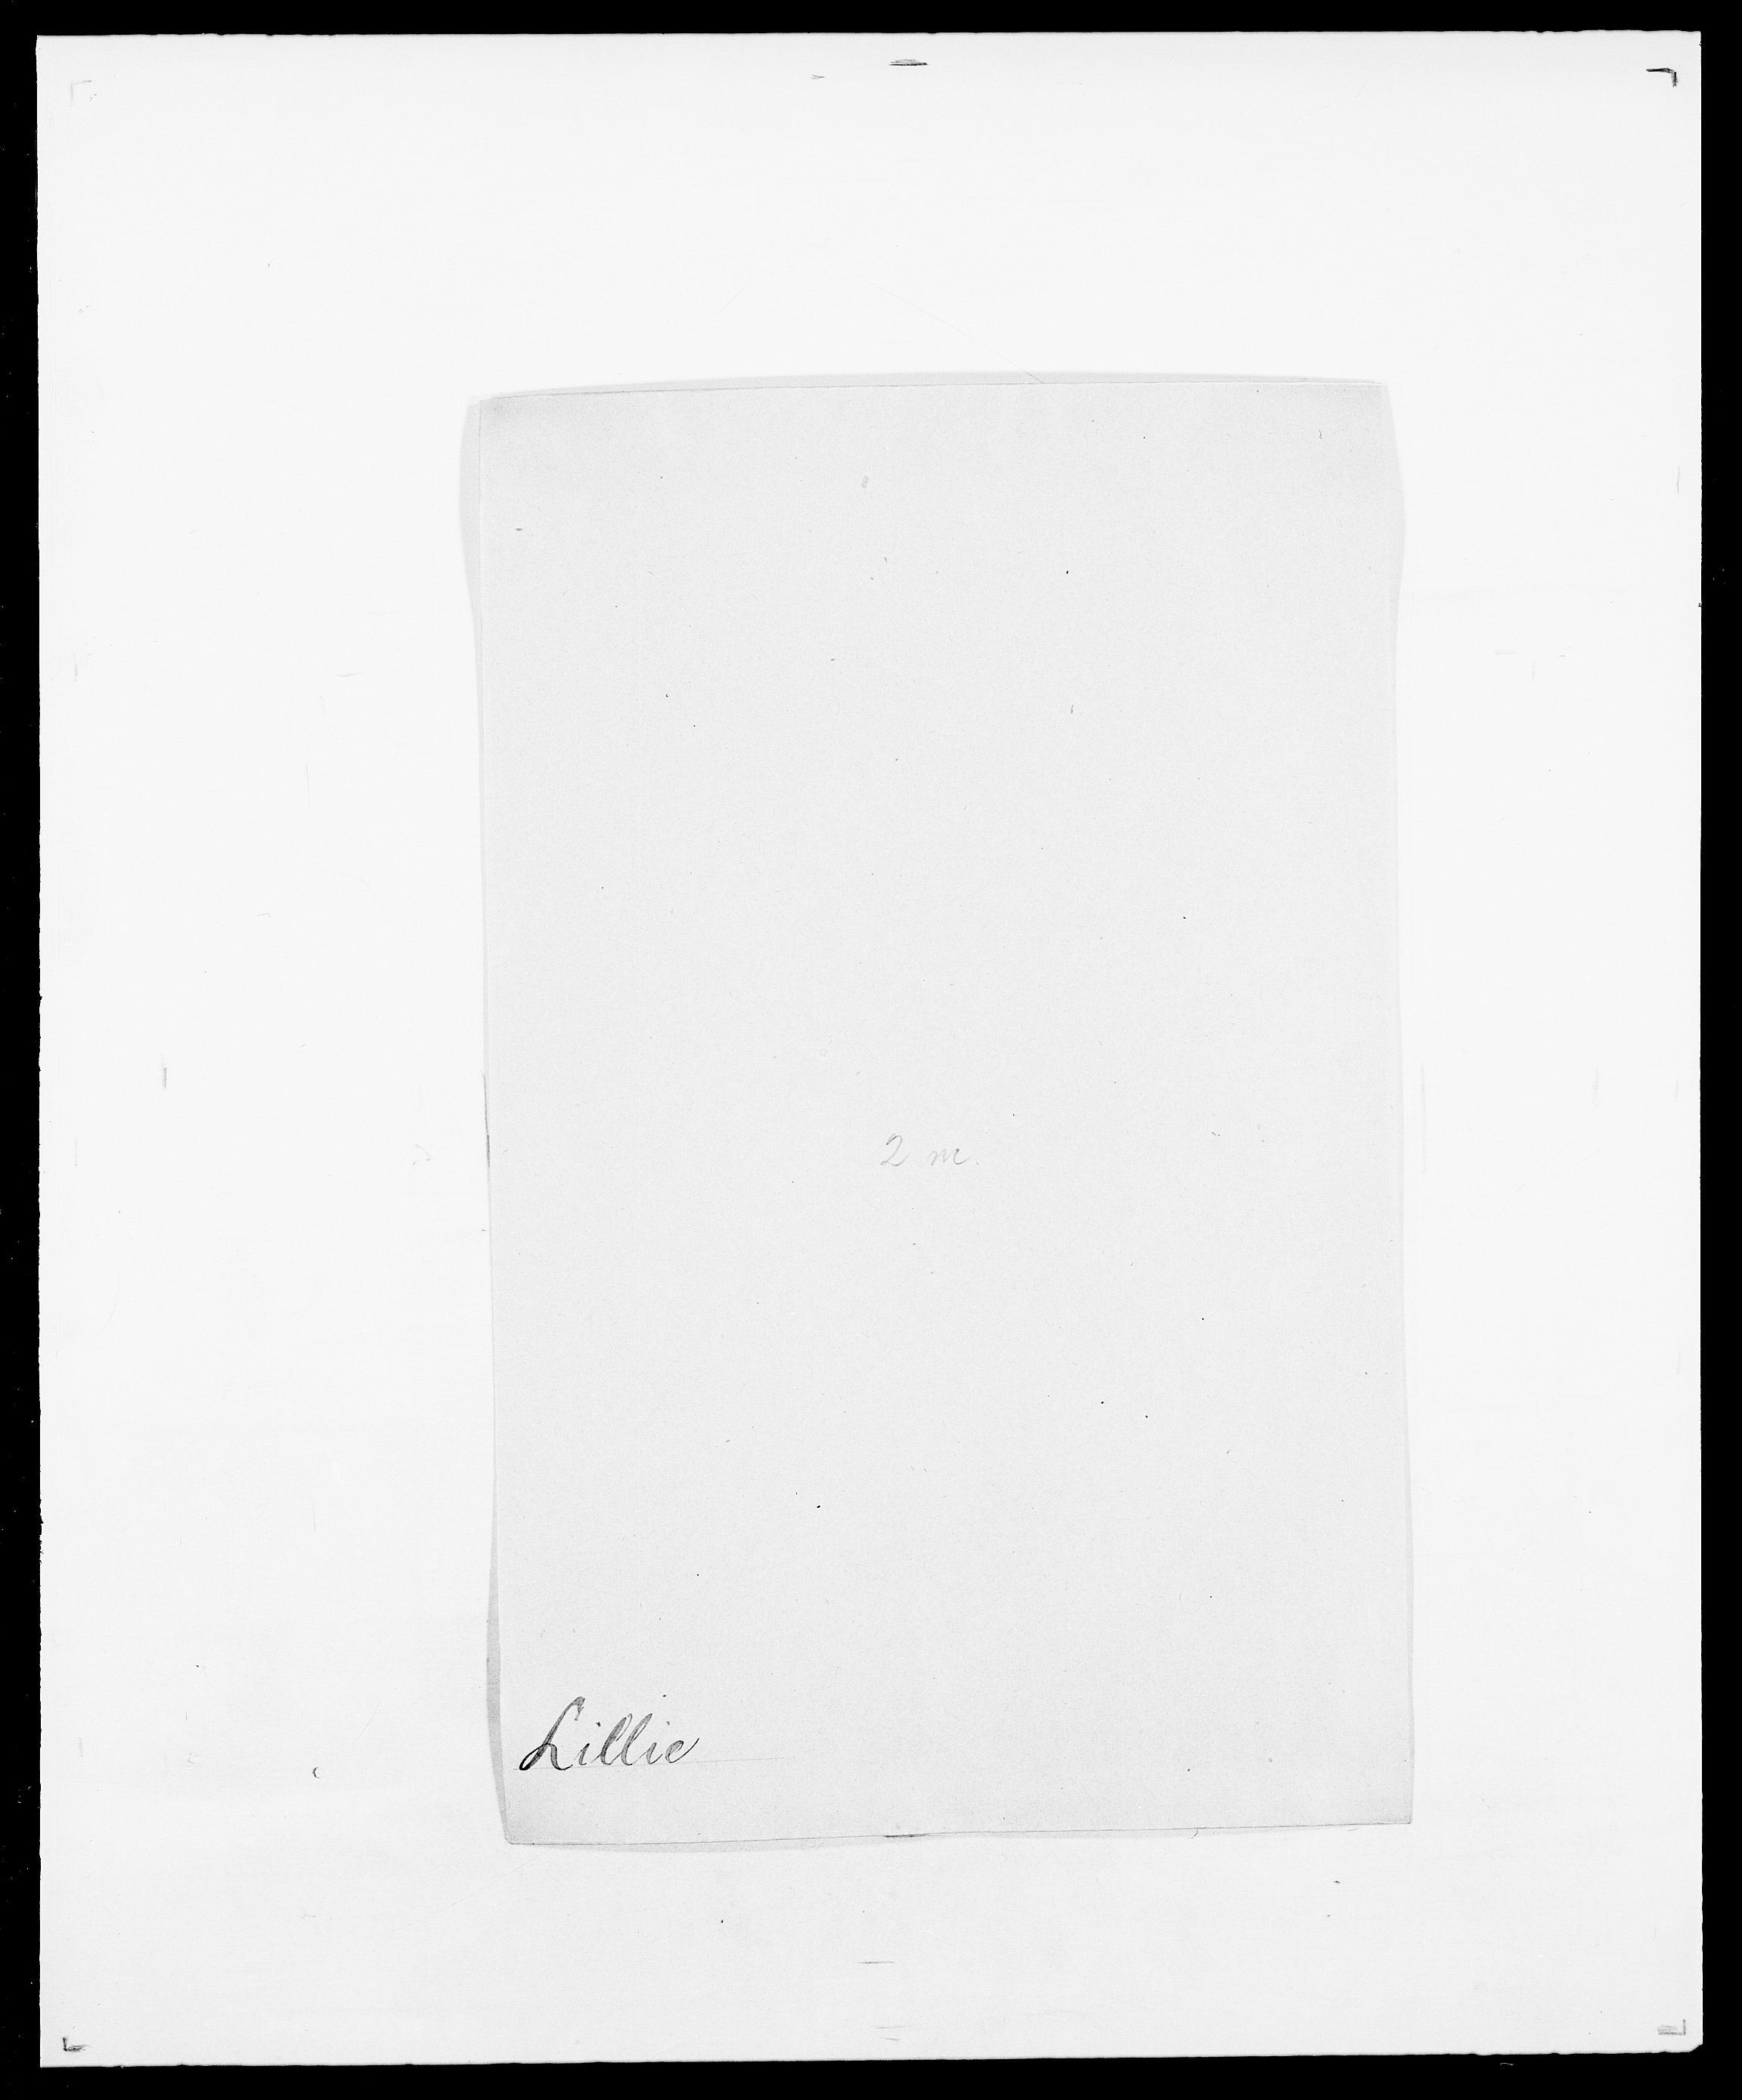 SAO, Delgobe, Charles Antoine - samling, D/Da/L0023: Lau - Lirvyn, s. 410